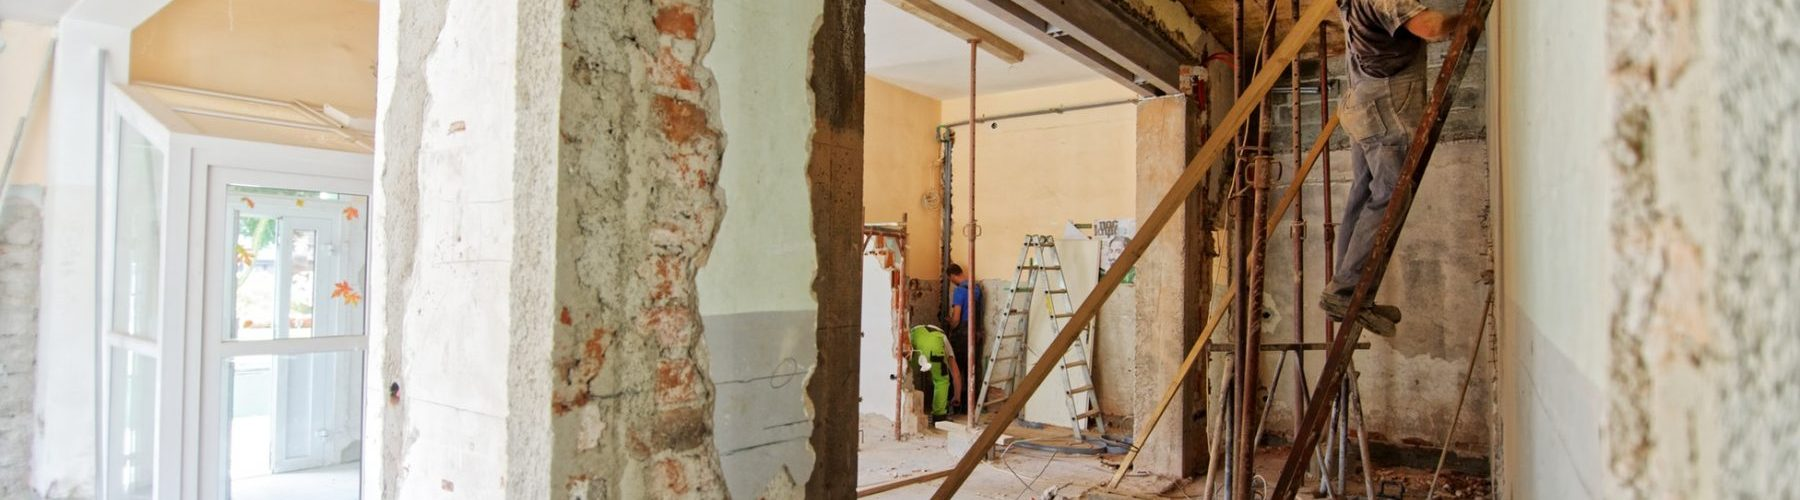 renovatie geurhinder